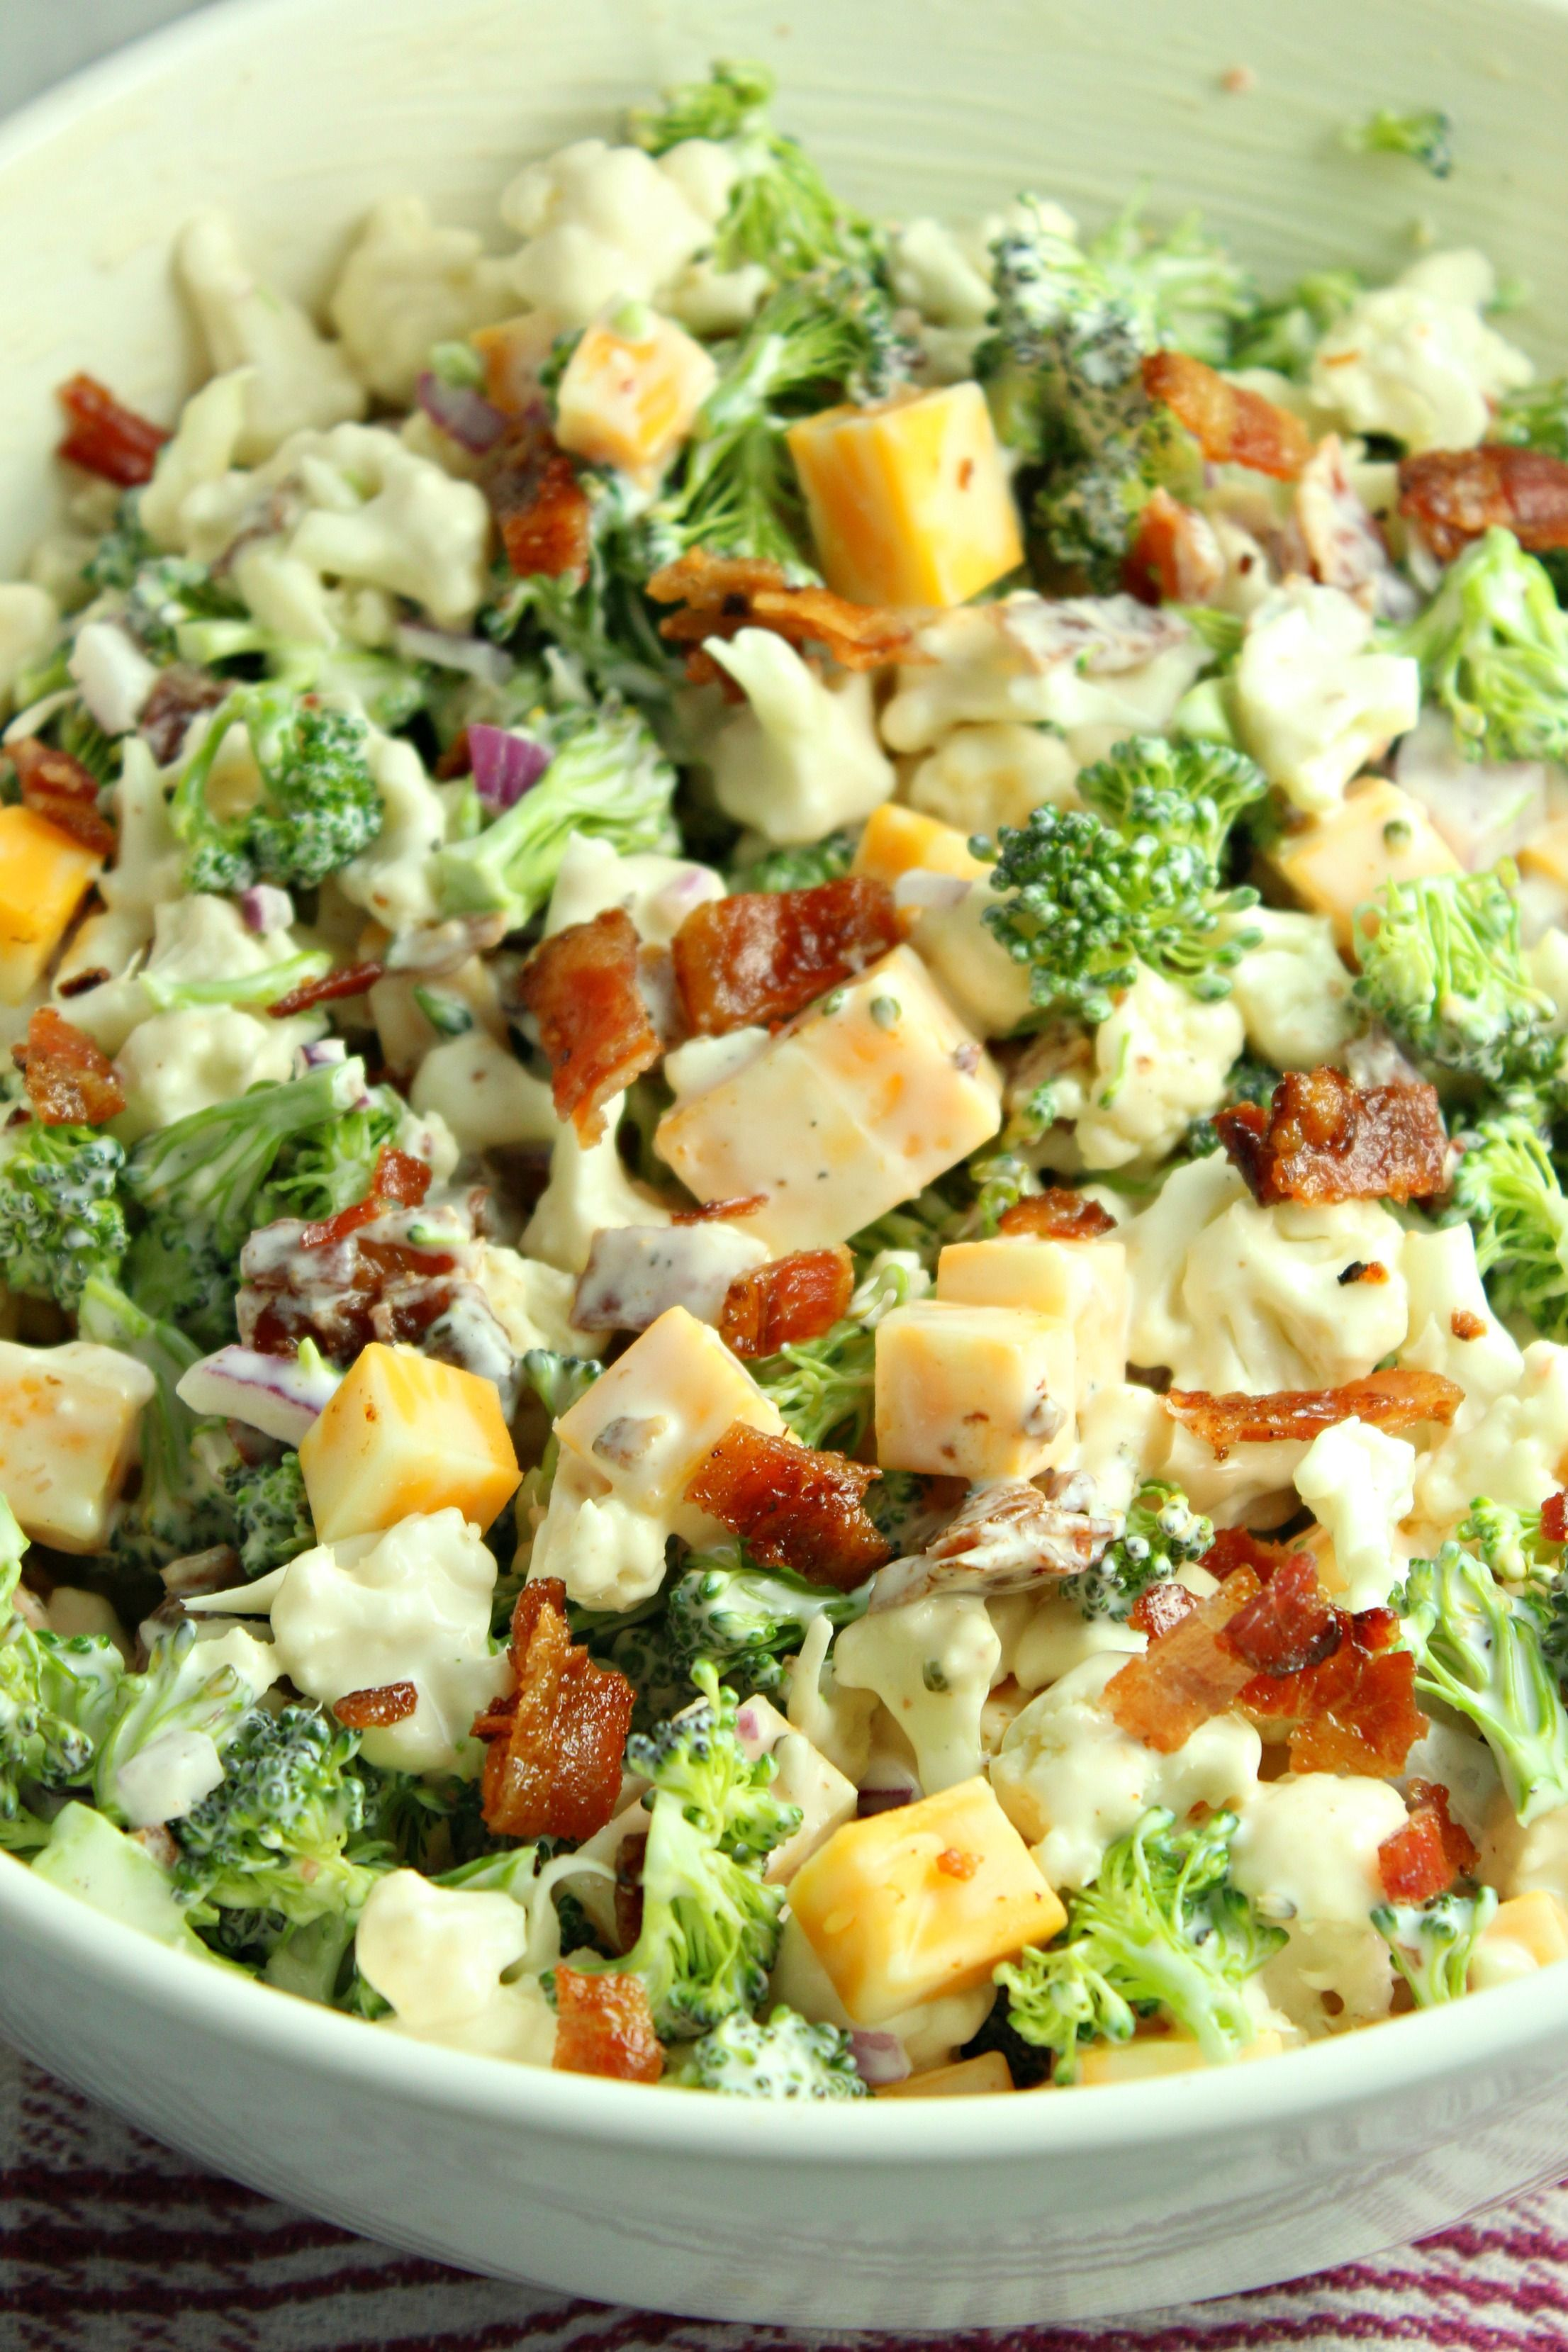 Loaded Broccoli Cauliflower Salad (Low Carb)